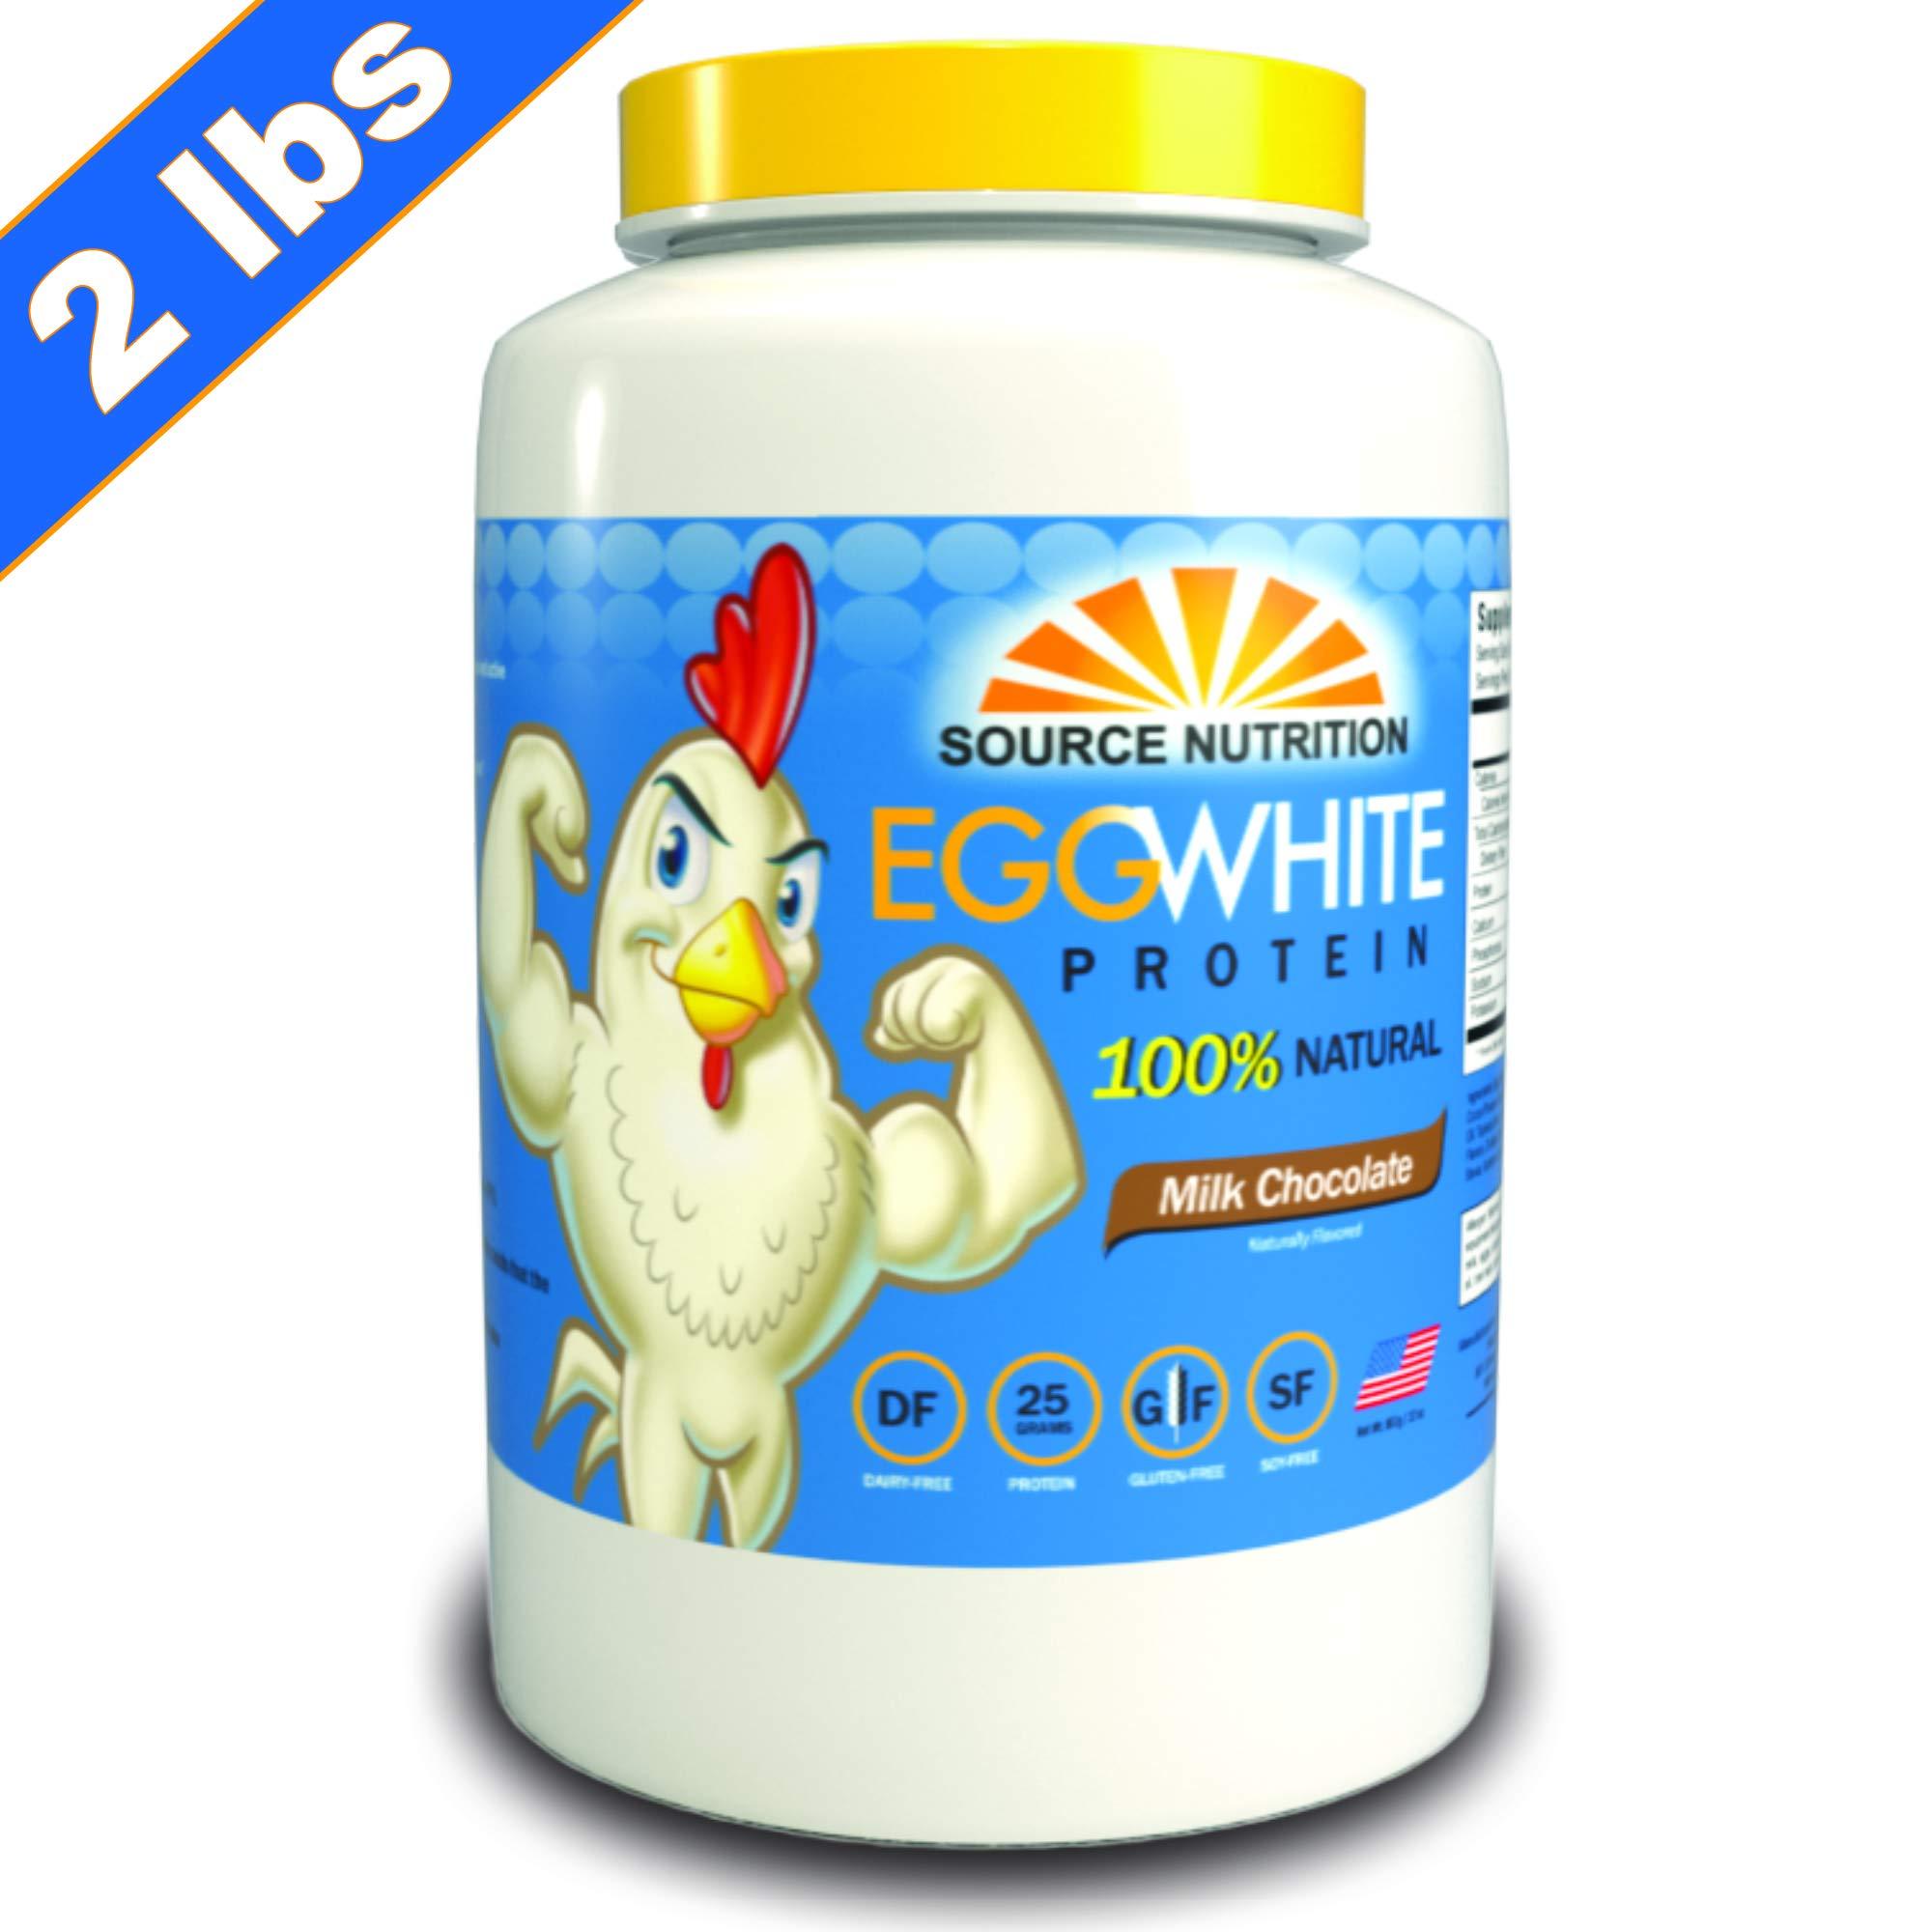 Egg White Protein Powder | All Natural Ingredients - 25g Protein, No Fat or Cholesterol, Zero Sugar - 2 Pound (Milk Chocolate) - Dairy Free Protein by TradeKing